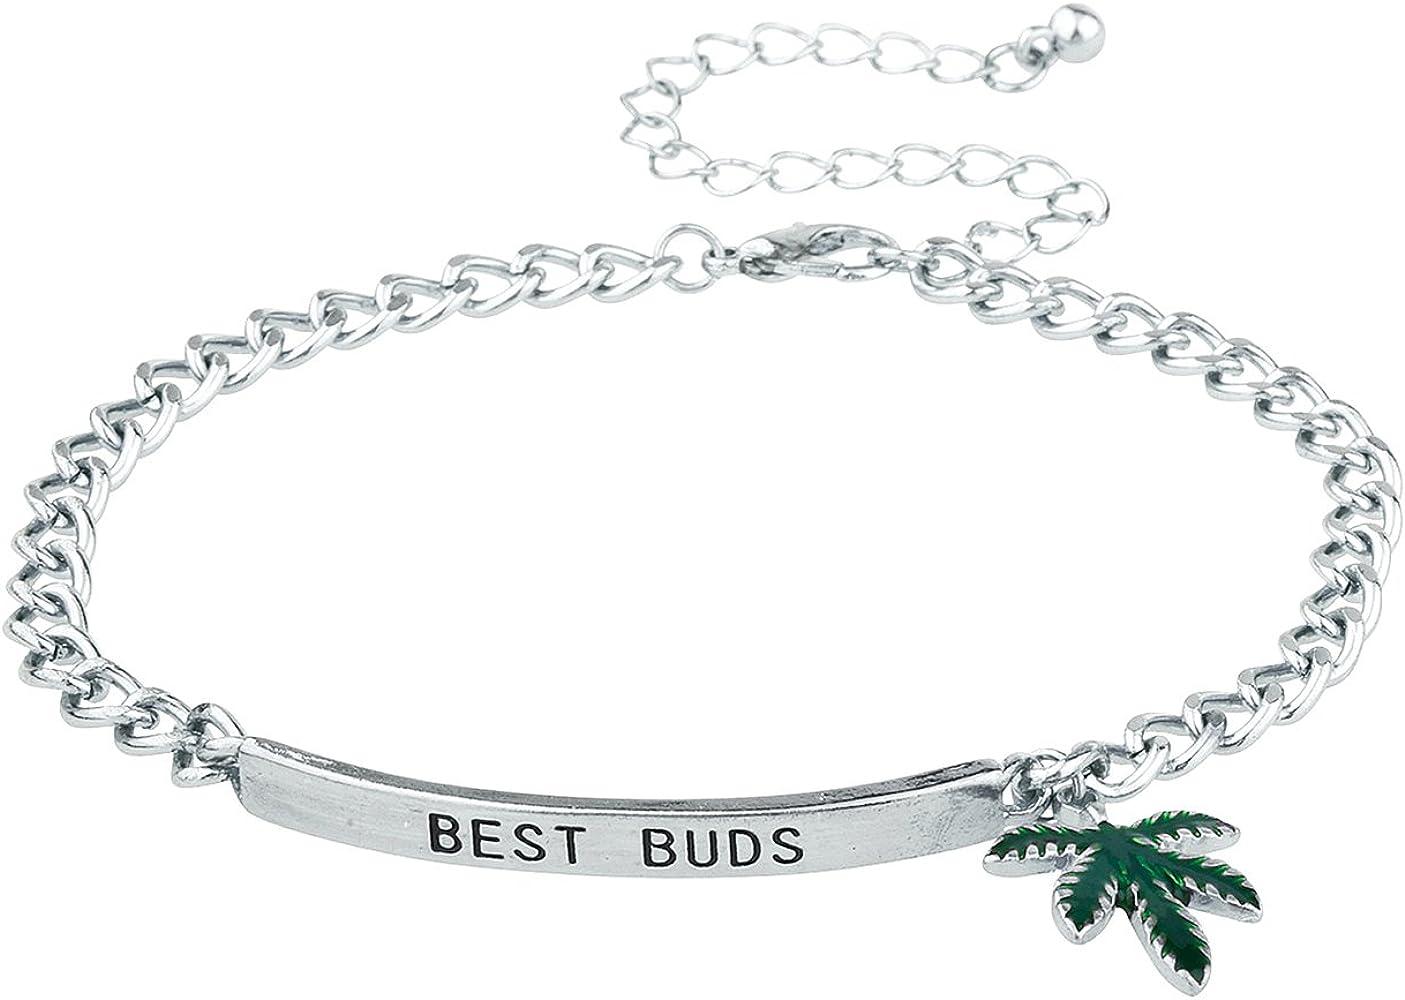 Stoner Bud life pot leaf hand stamped cuff bracelets 420 cannabis jewelry marijuana jewelry BFF